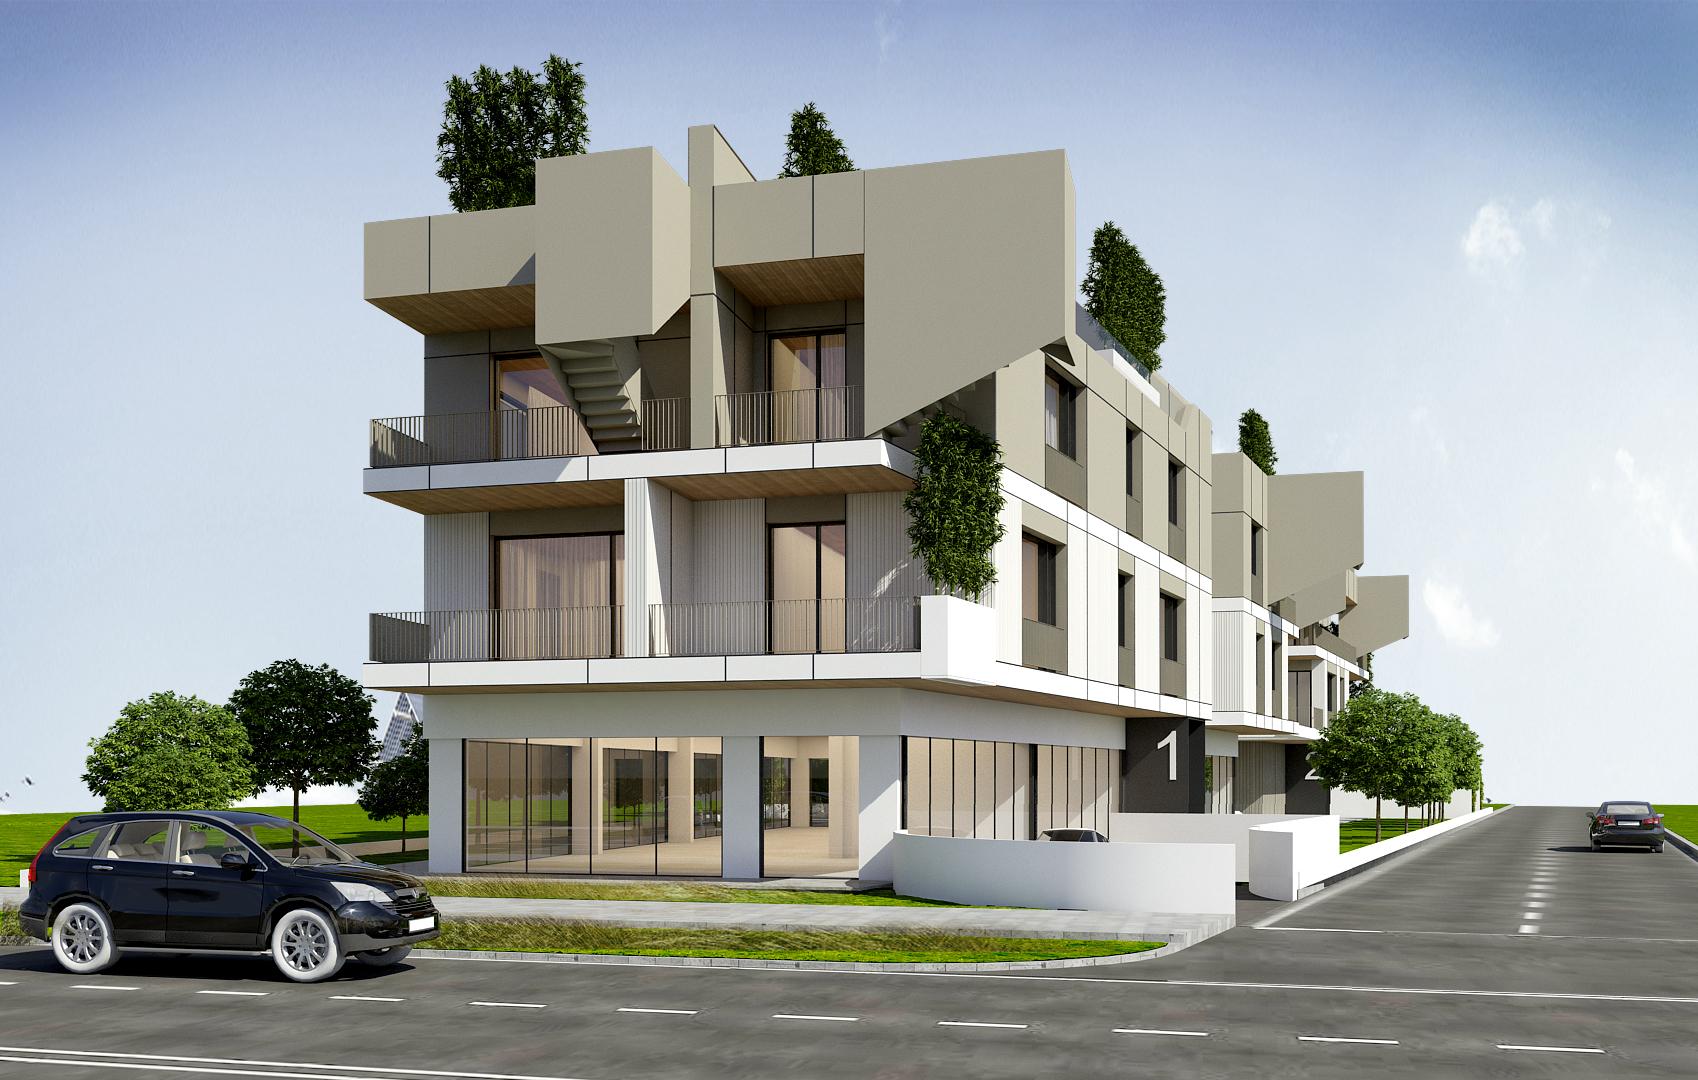 https://nbc-arhitect.ro/wp-content/uploads/2021/09/Coralilor-2.jpg